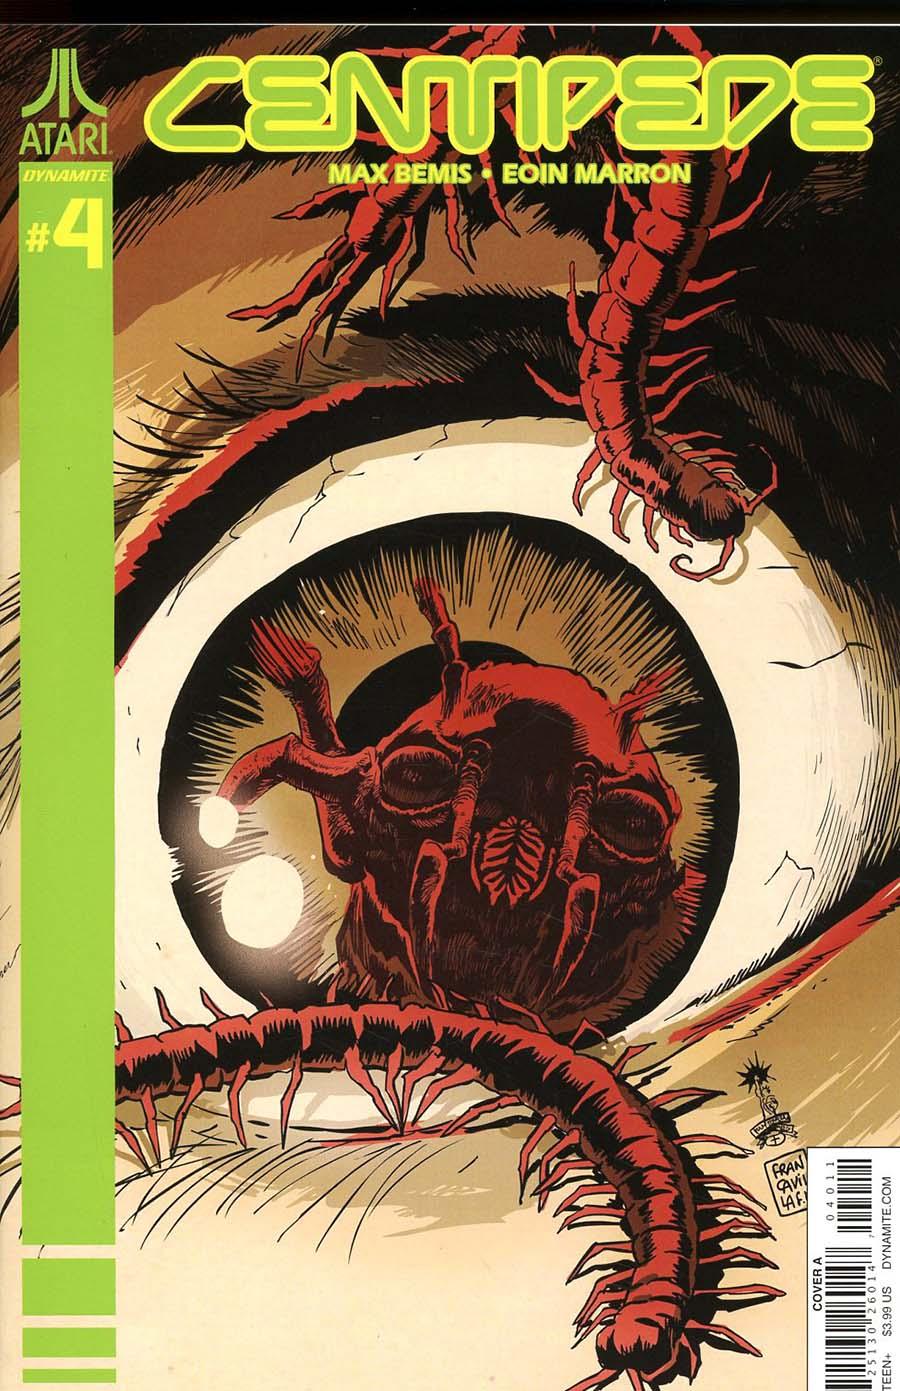 Centipede #4 Cover A Regular Francesco Francavilla Cover